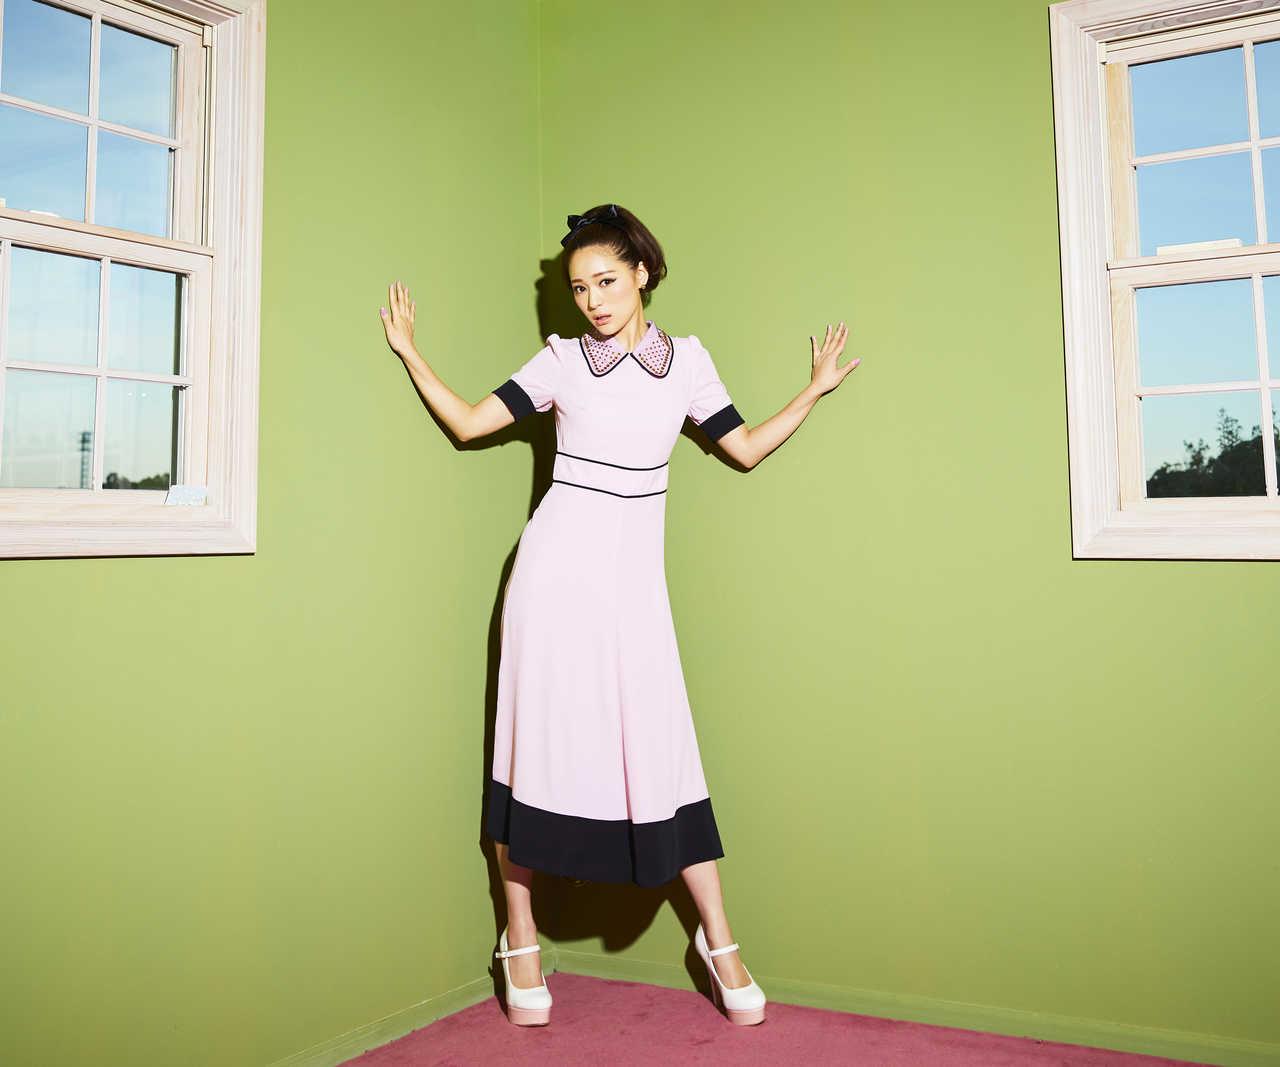 chay、2年5ヶ月ぶりとなる3枚目のフルアルバム「Lavender」11月13日発売決定!